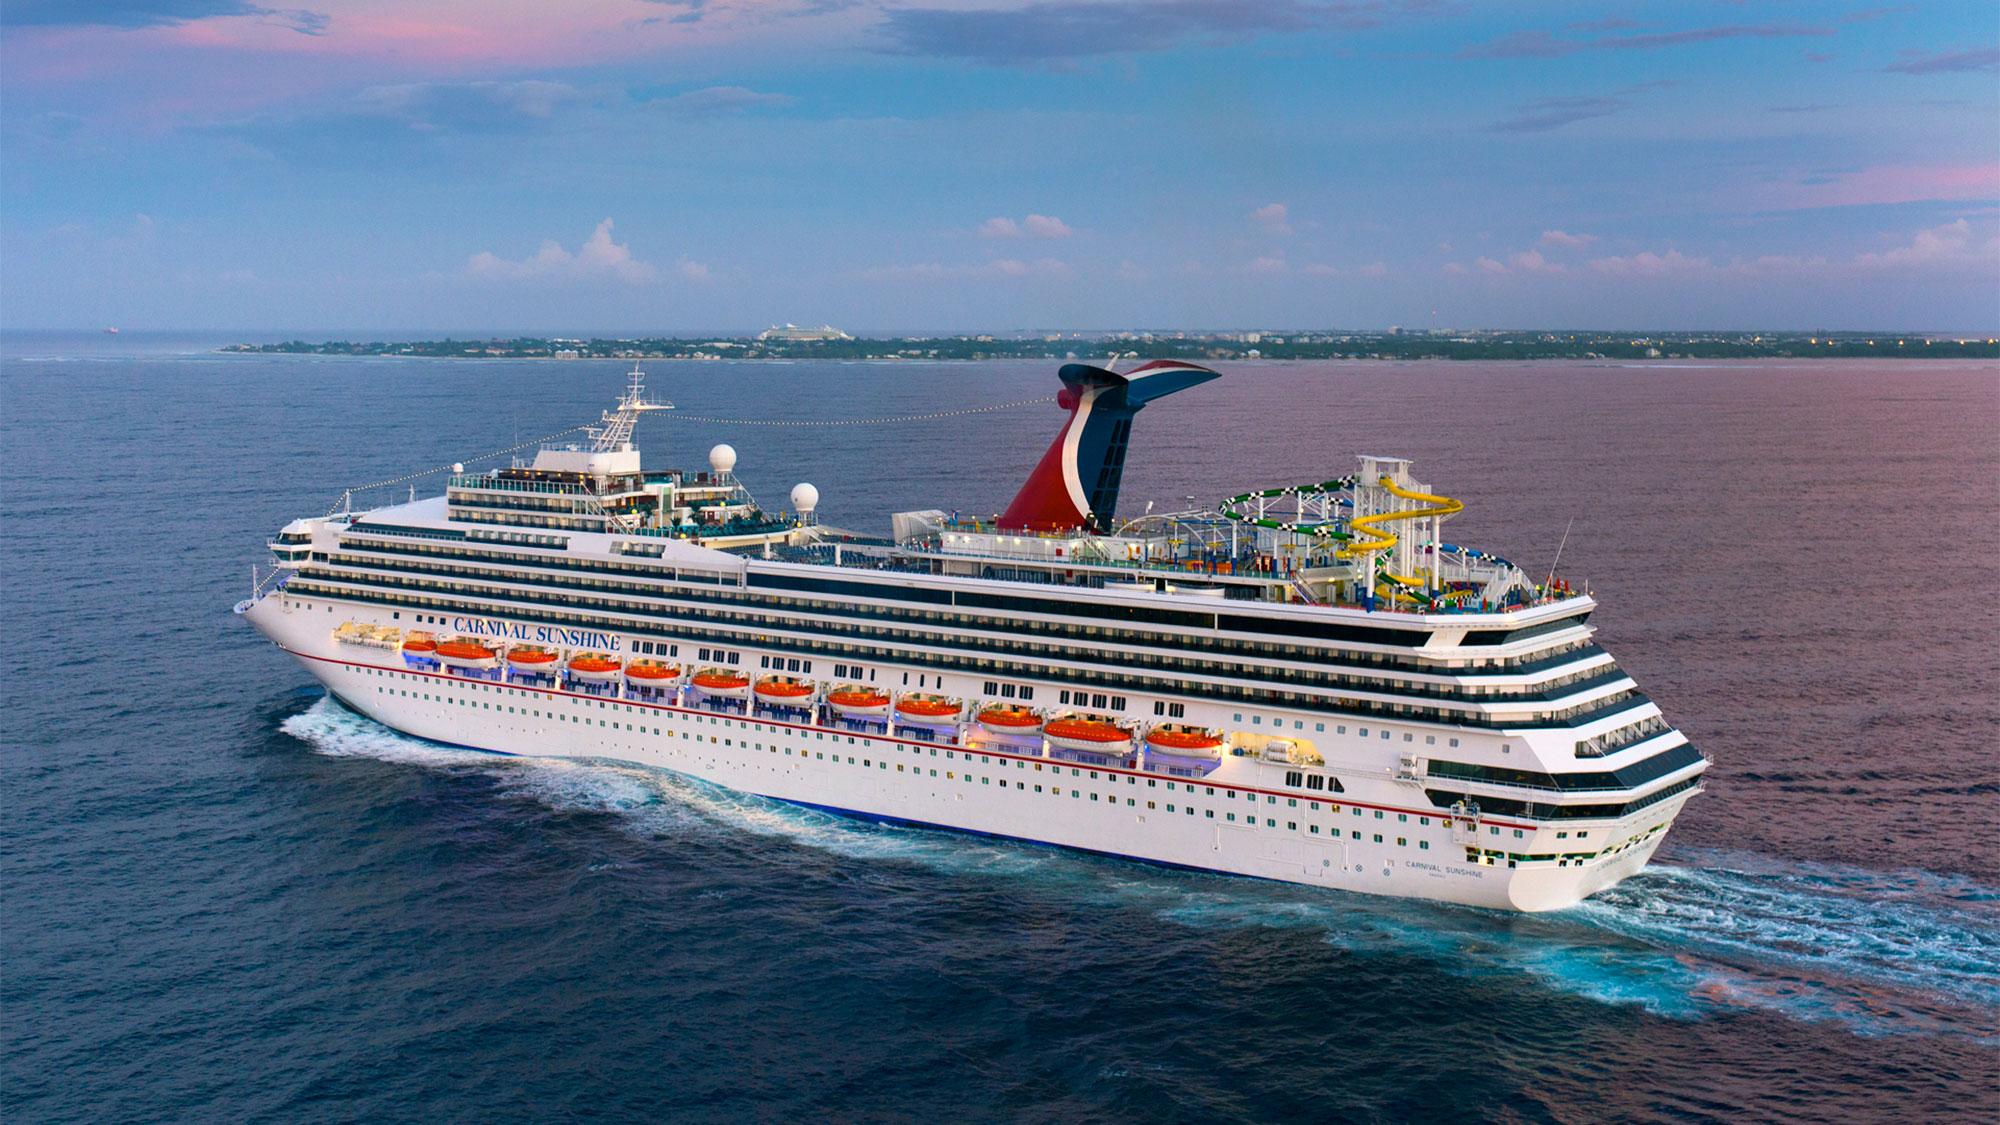 Carnival Moving Bigger Ship To Charleston Travel Weekly - How big is a carnival cruise ship